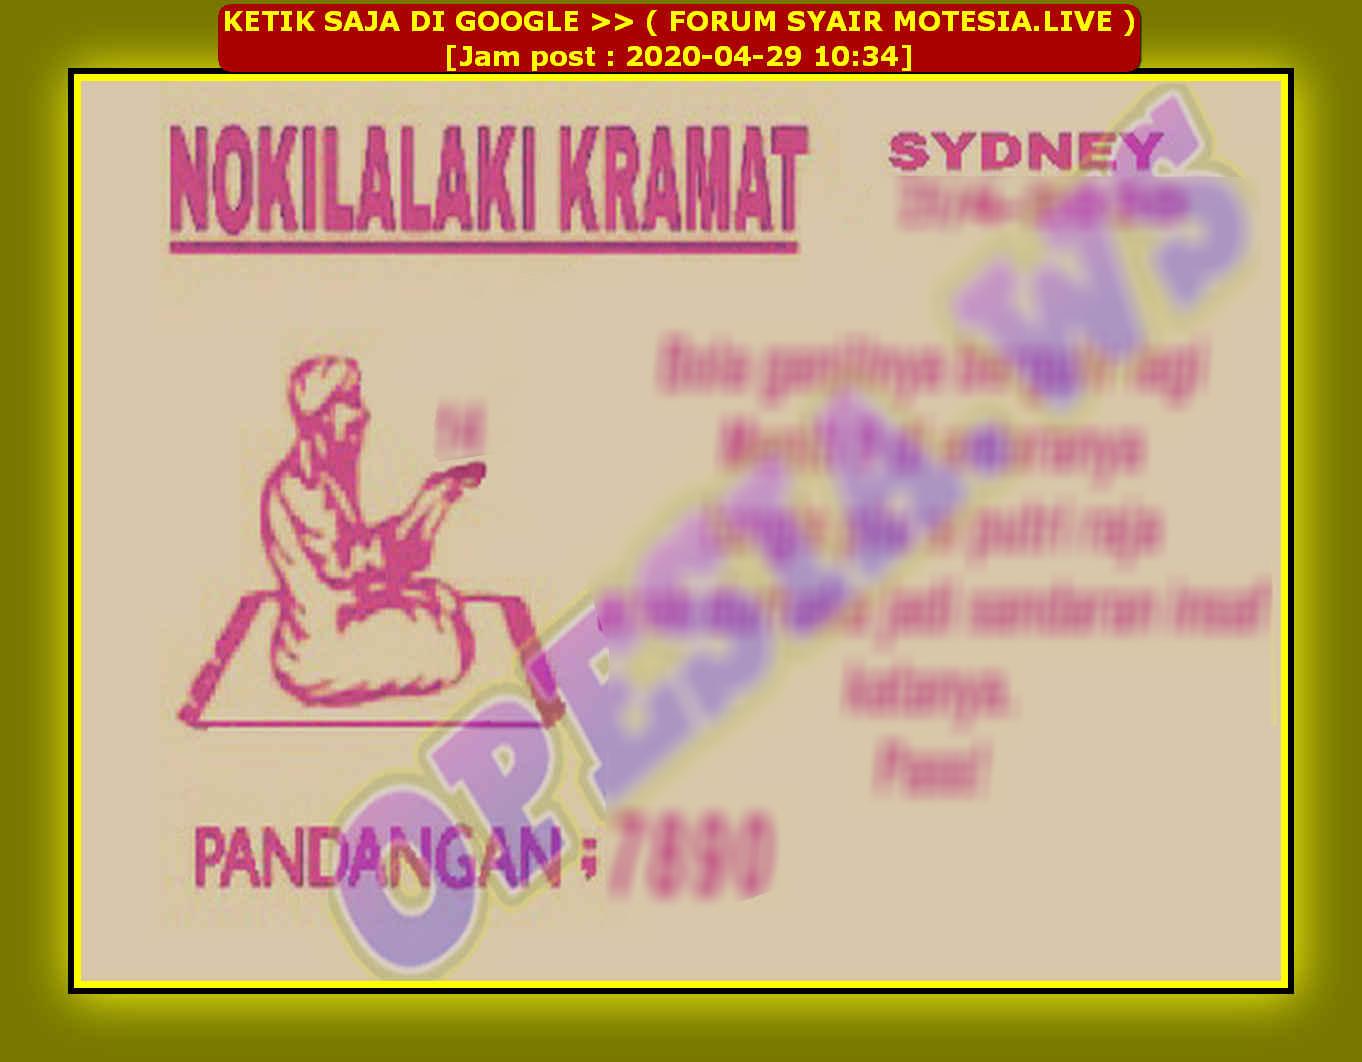 Kode syair Sydney Rabu 29 April 2020 17